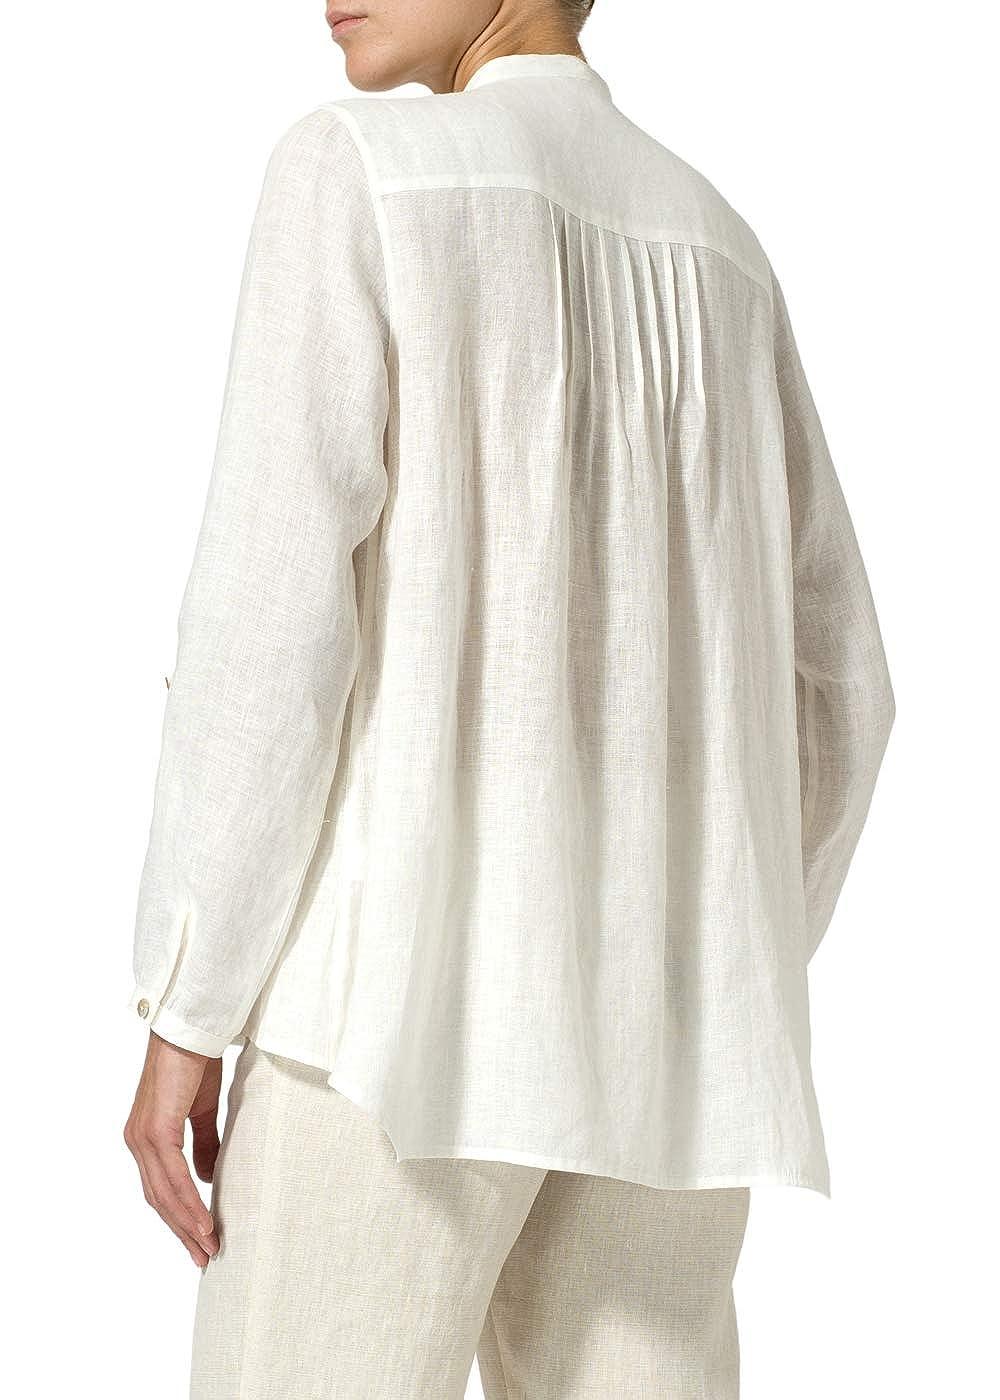 Vivid Linen Pleated A Line Shirt